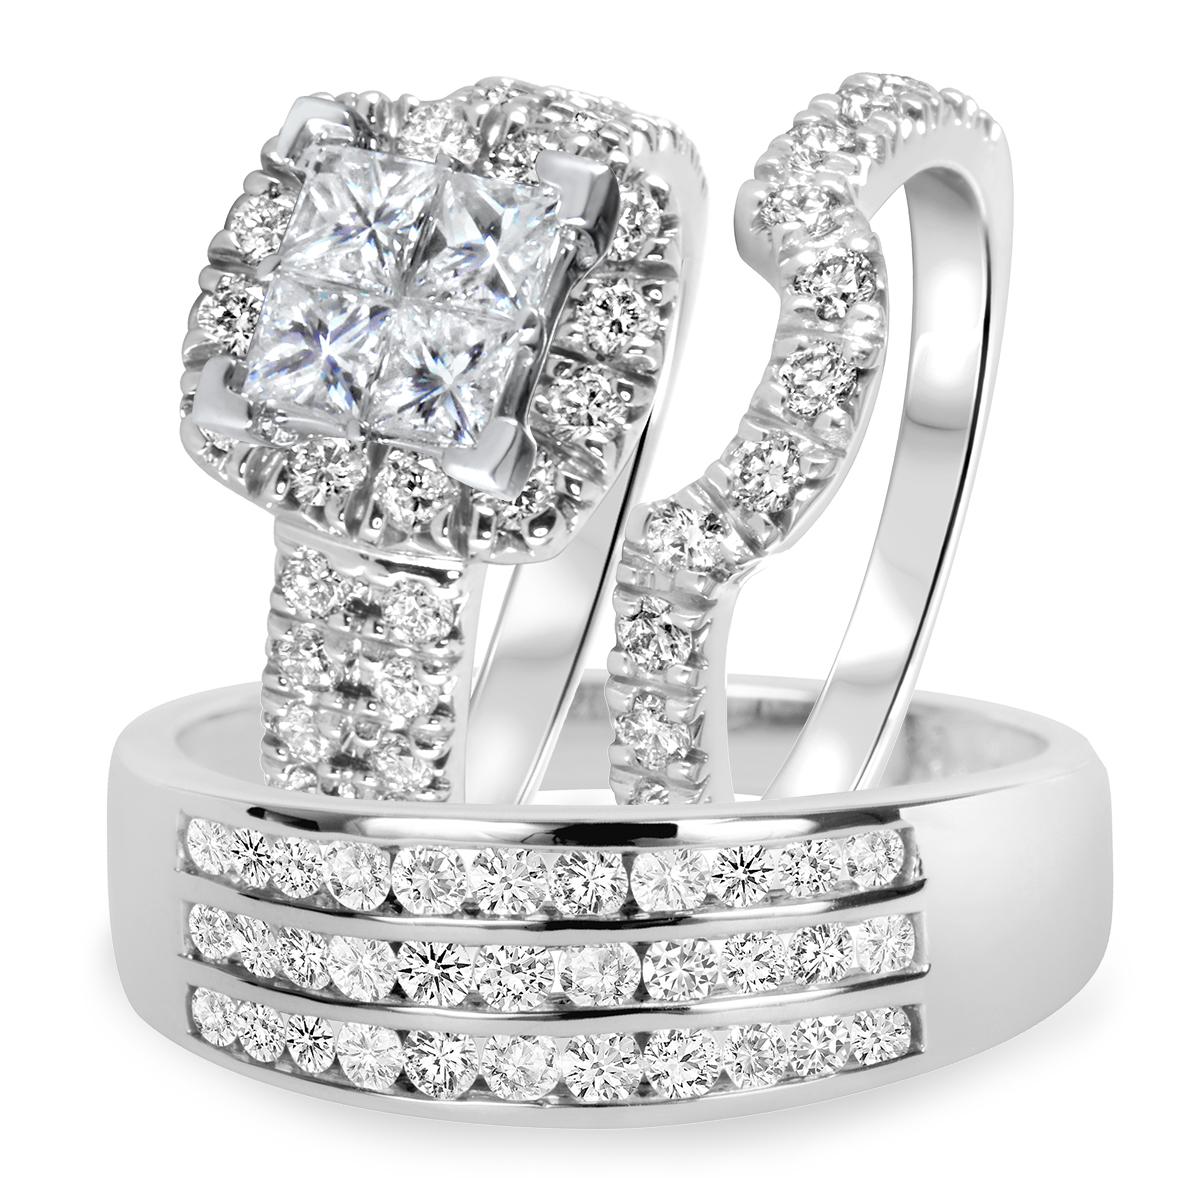 2 2/3 CT. T.W. Diamond Ladies Engagement Ring, Wedding Band, Men's Wedding Band